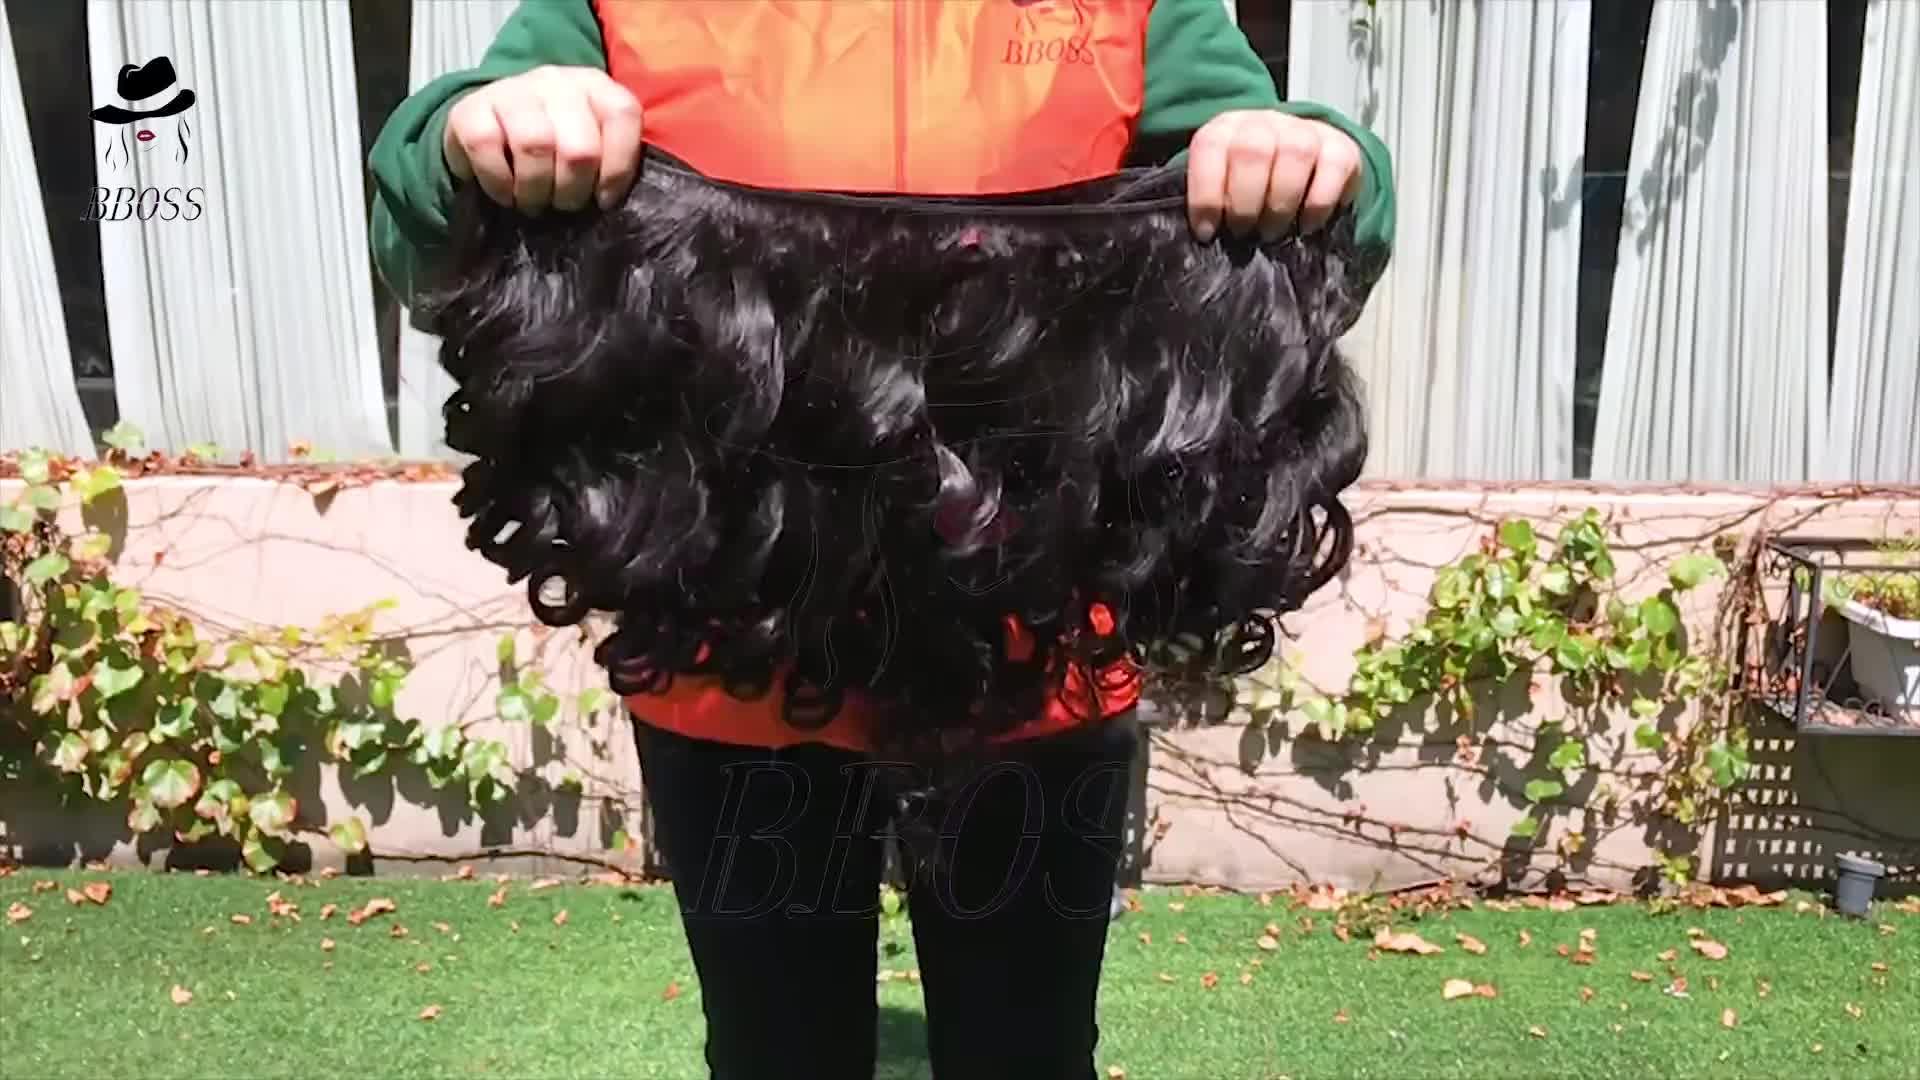 Free Sample 100 human brand name hair weave,model model hair extension wholesale,good quality salt and pepper hair